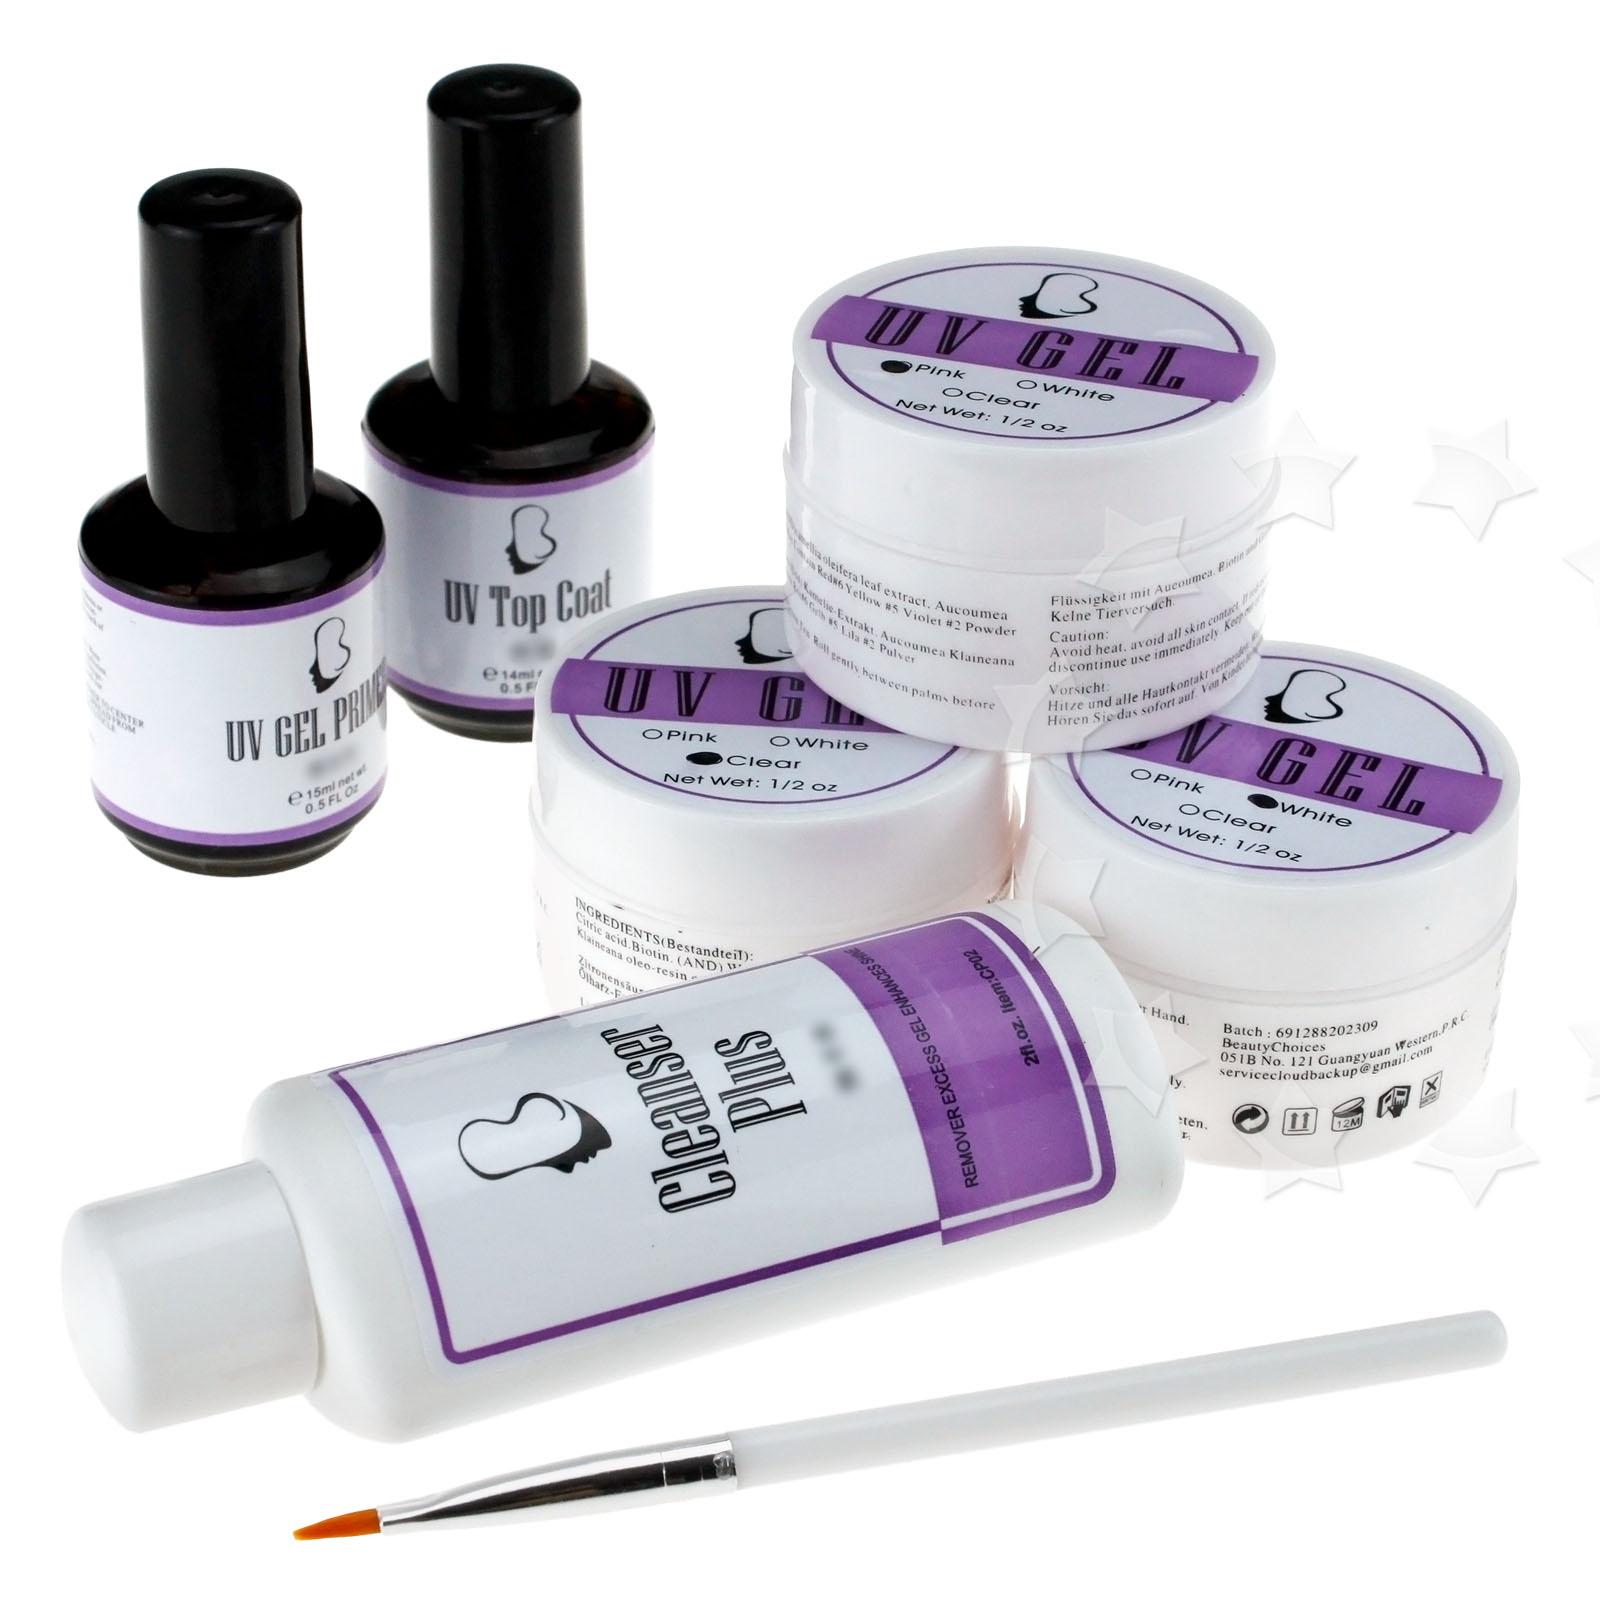 full uv gel nail set top coat cleanser plus brush base kit ebay. Black Bedroom Furniture Sets. Home Design Ideas